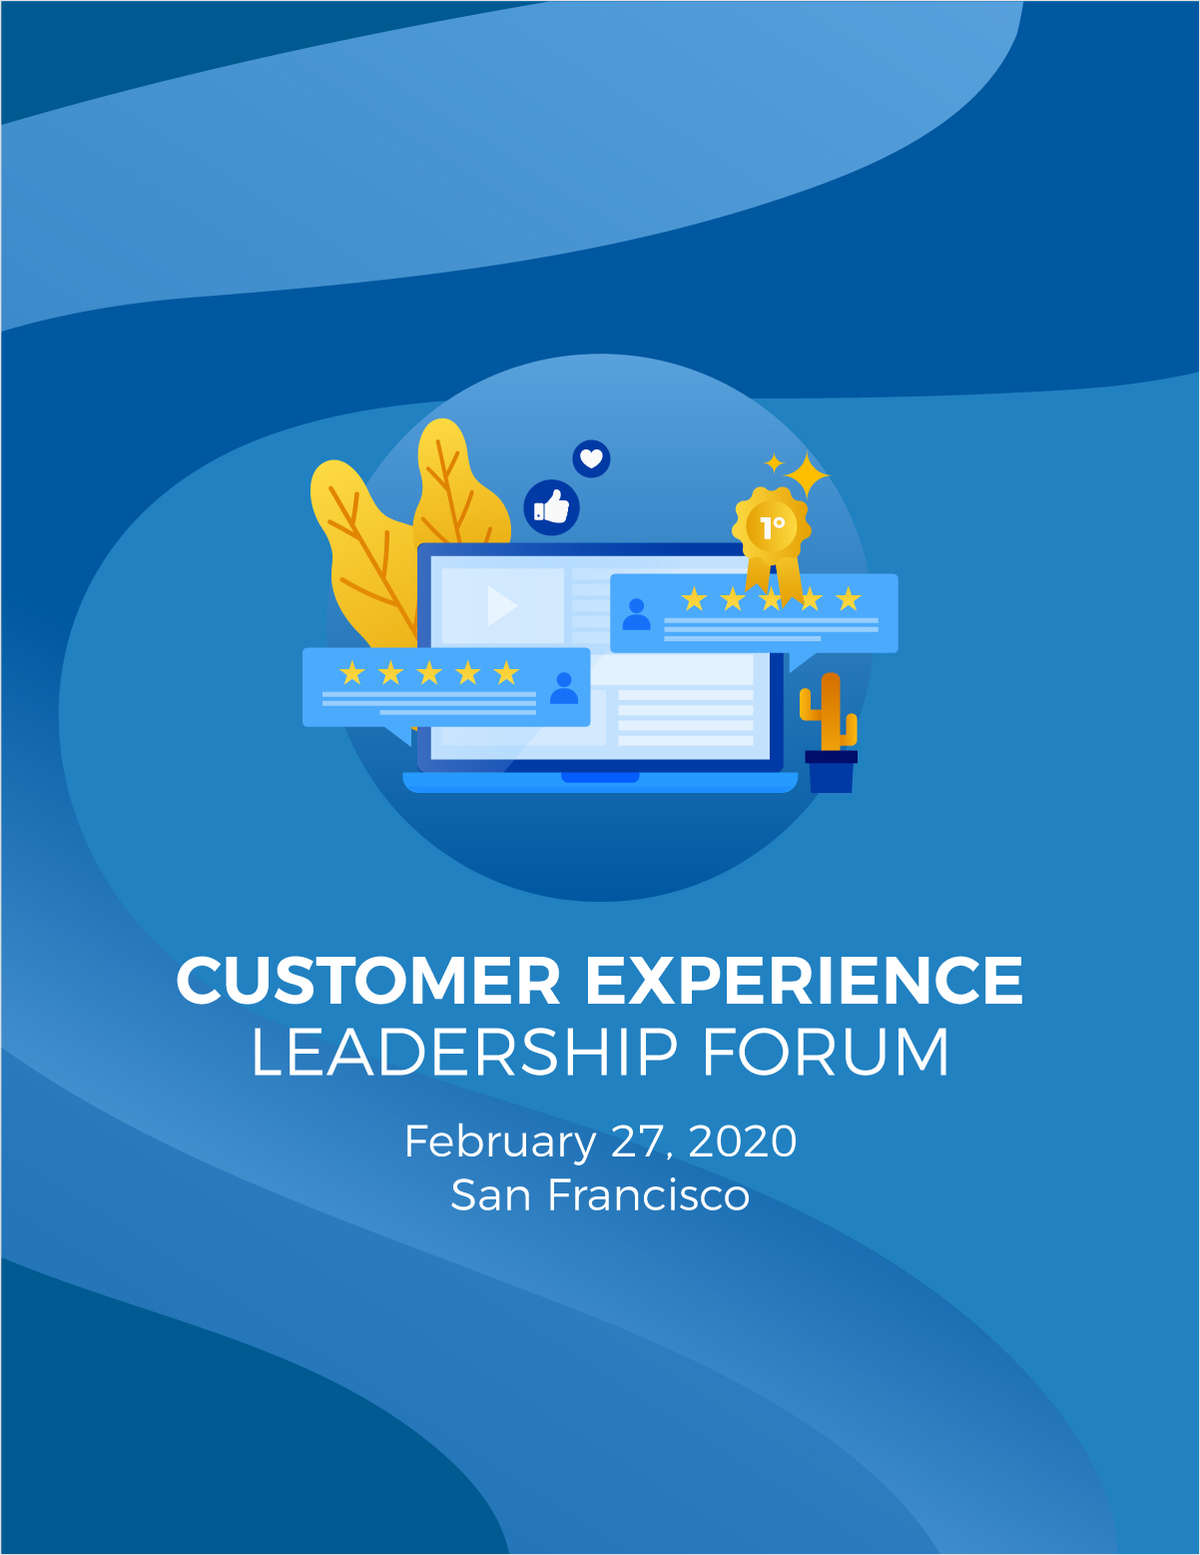 Customer Experience Leadership Forum